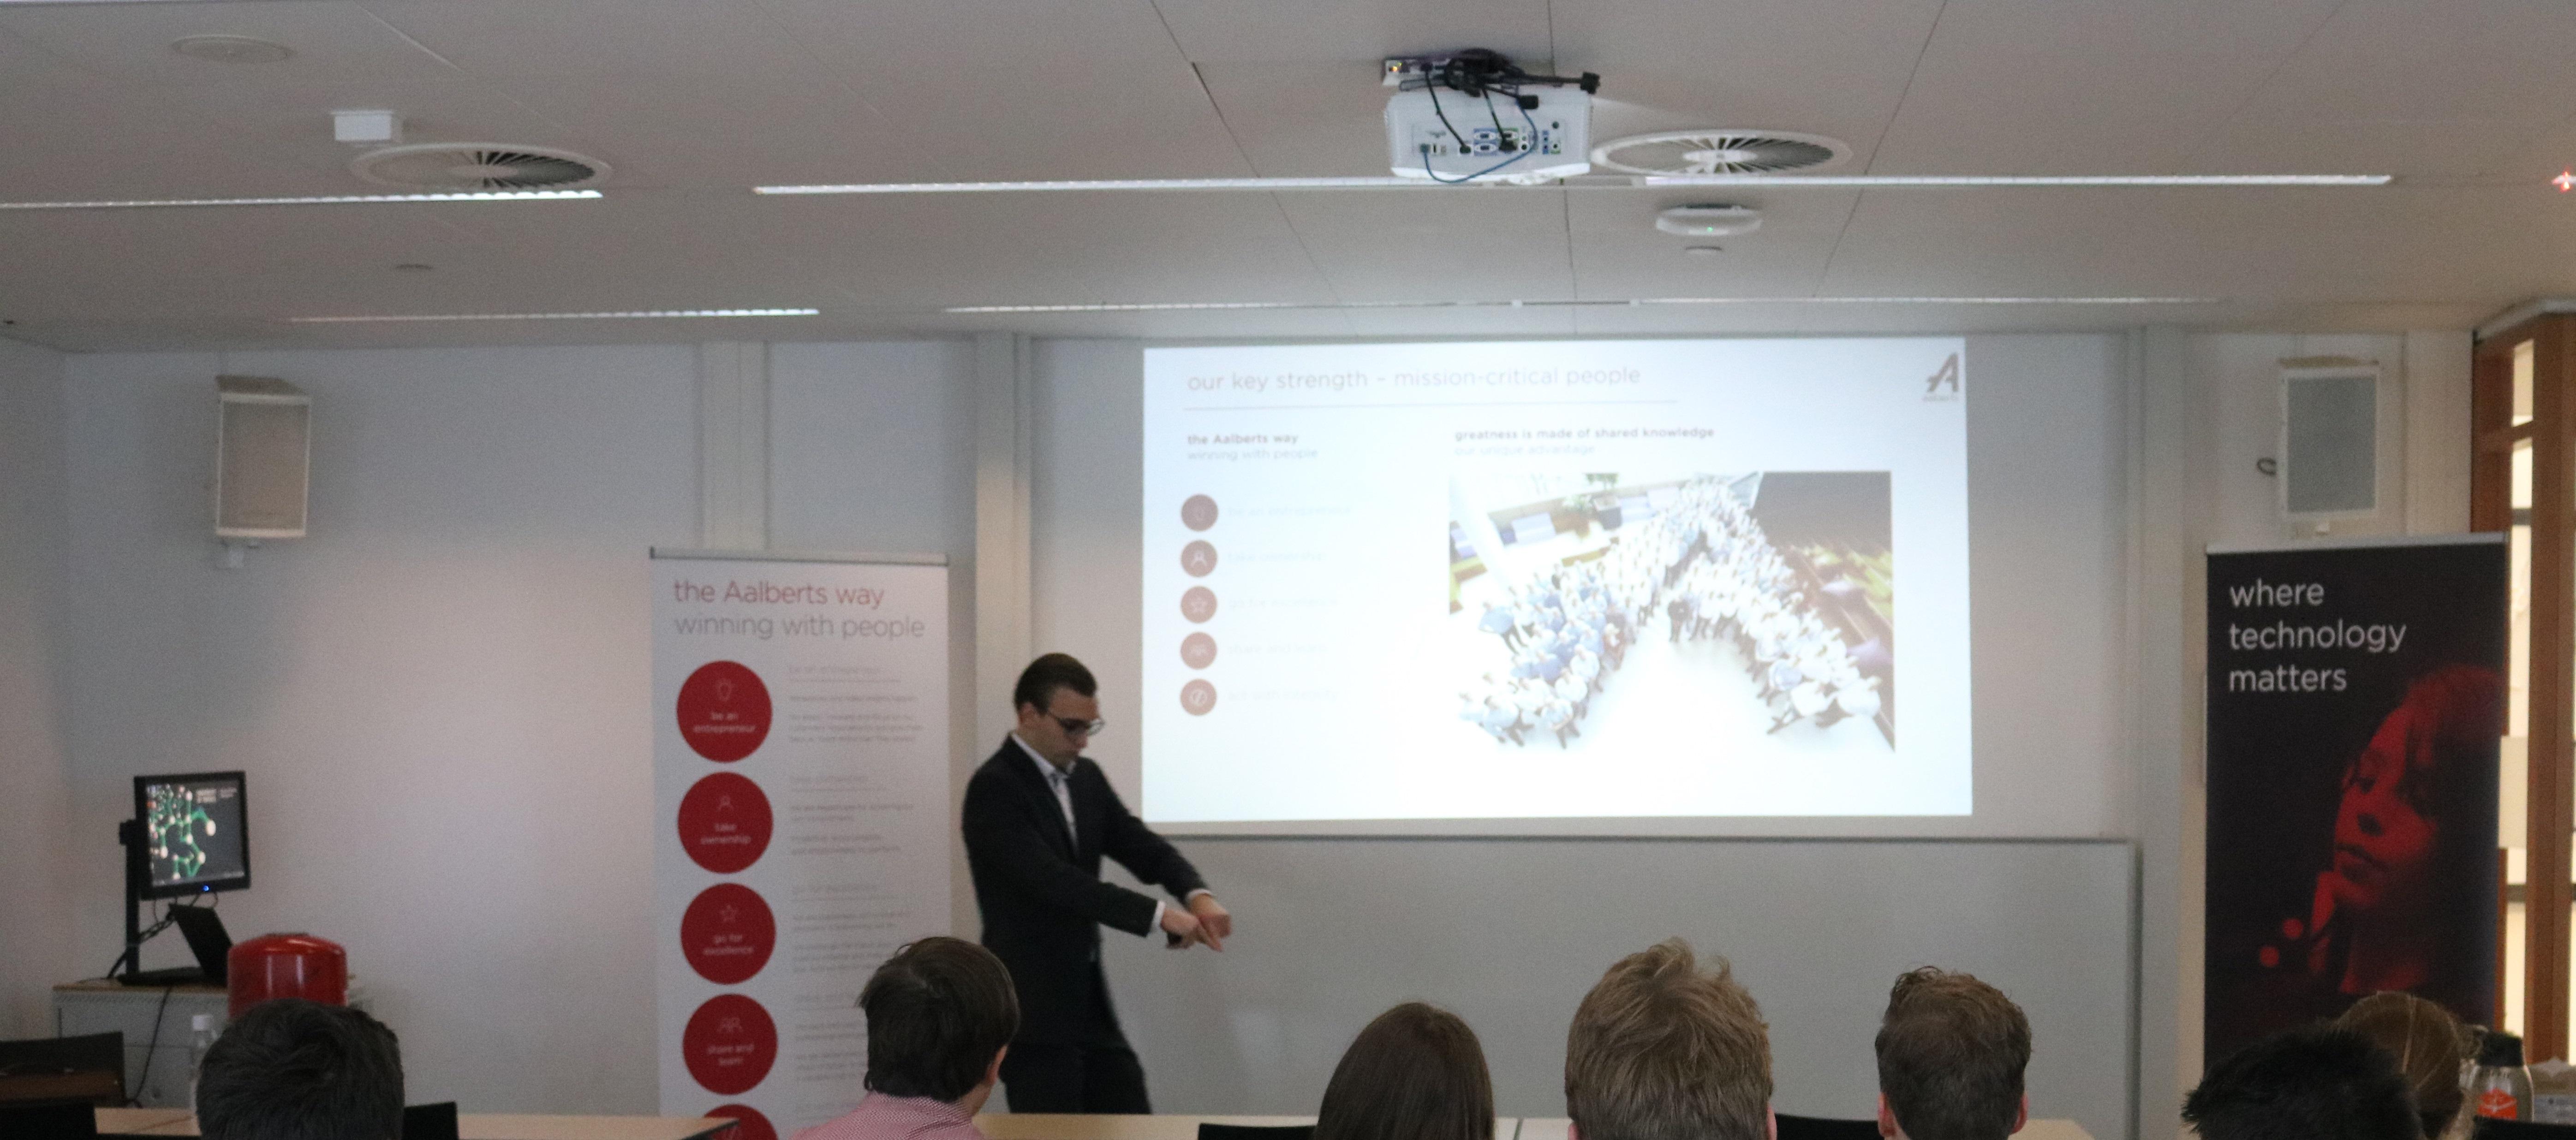 presenting trainee programme at University of Twente